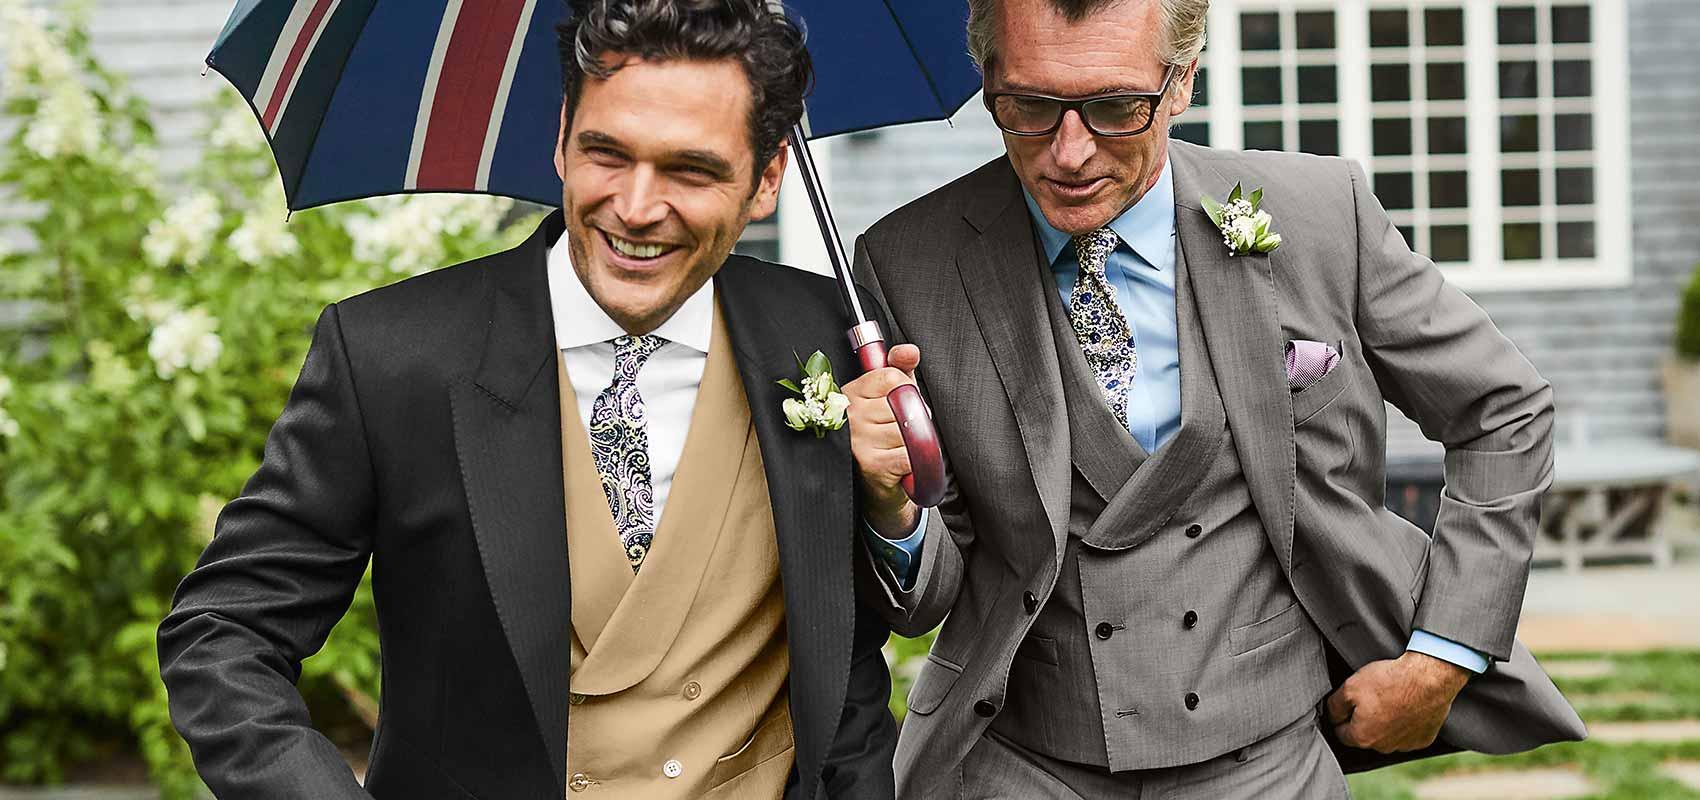 Charles Tyrwhitt cutaway suits